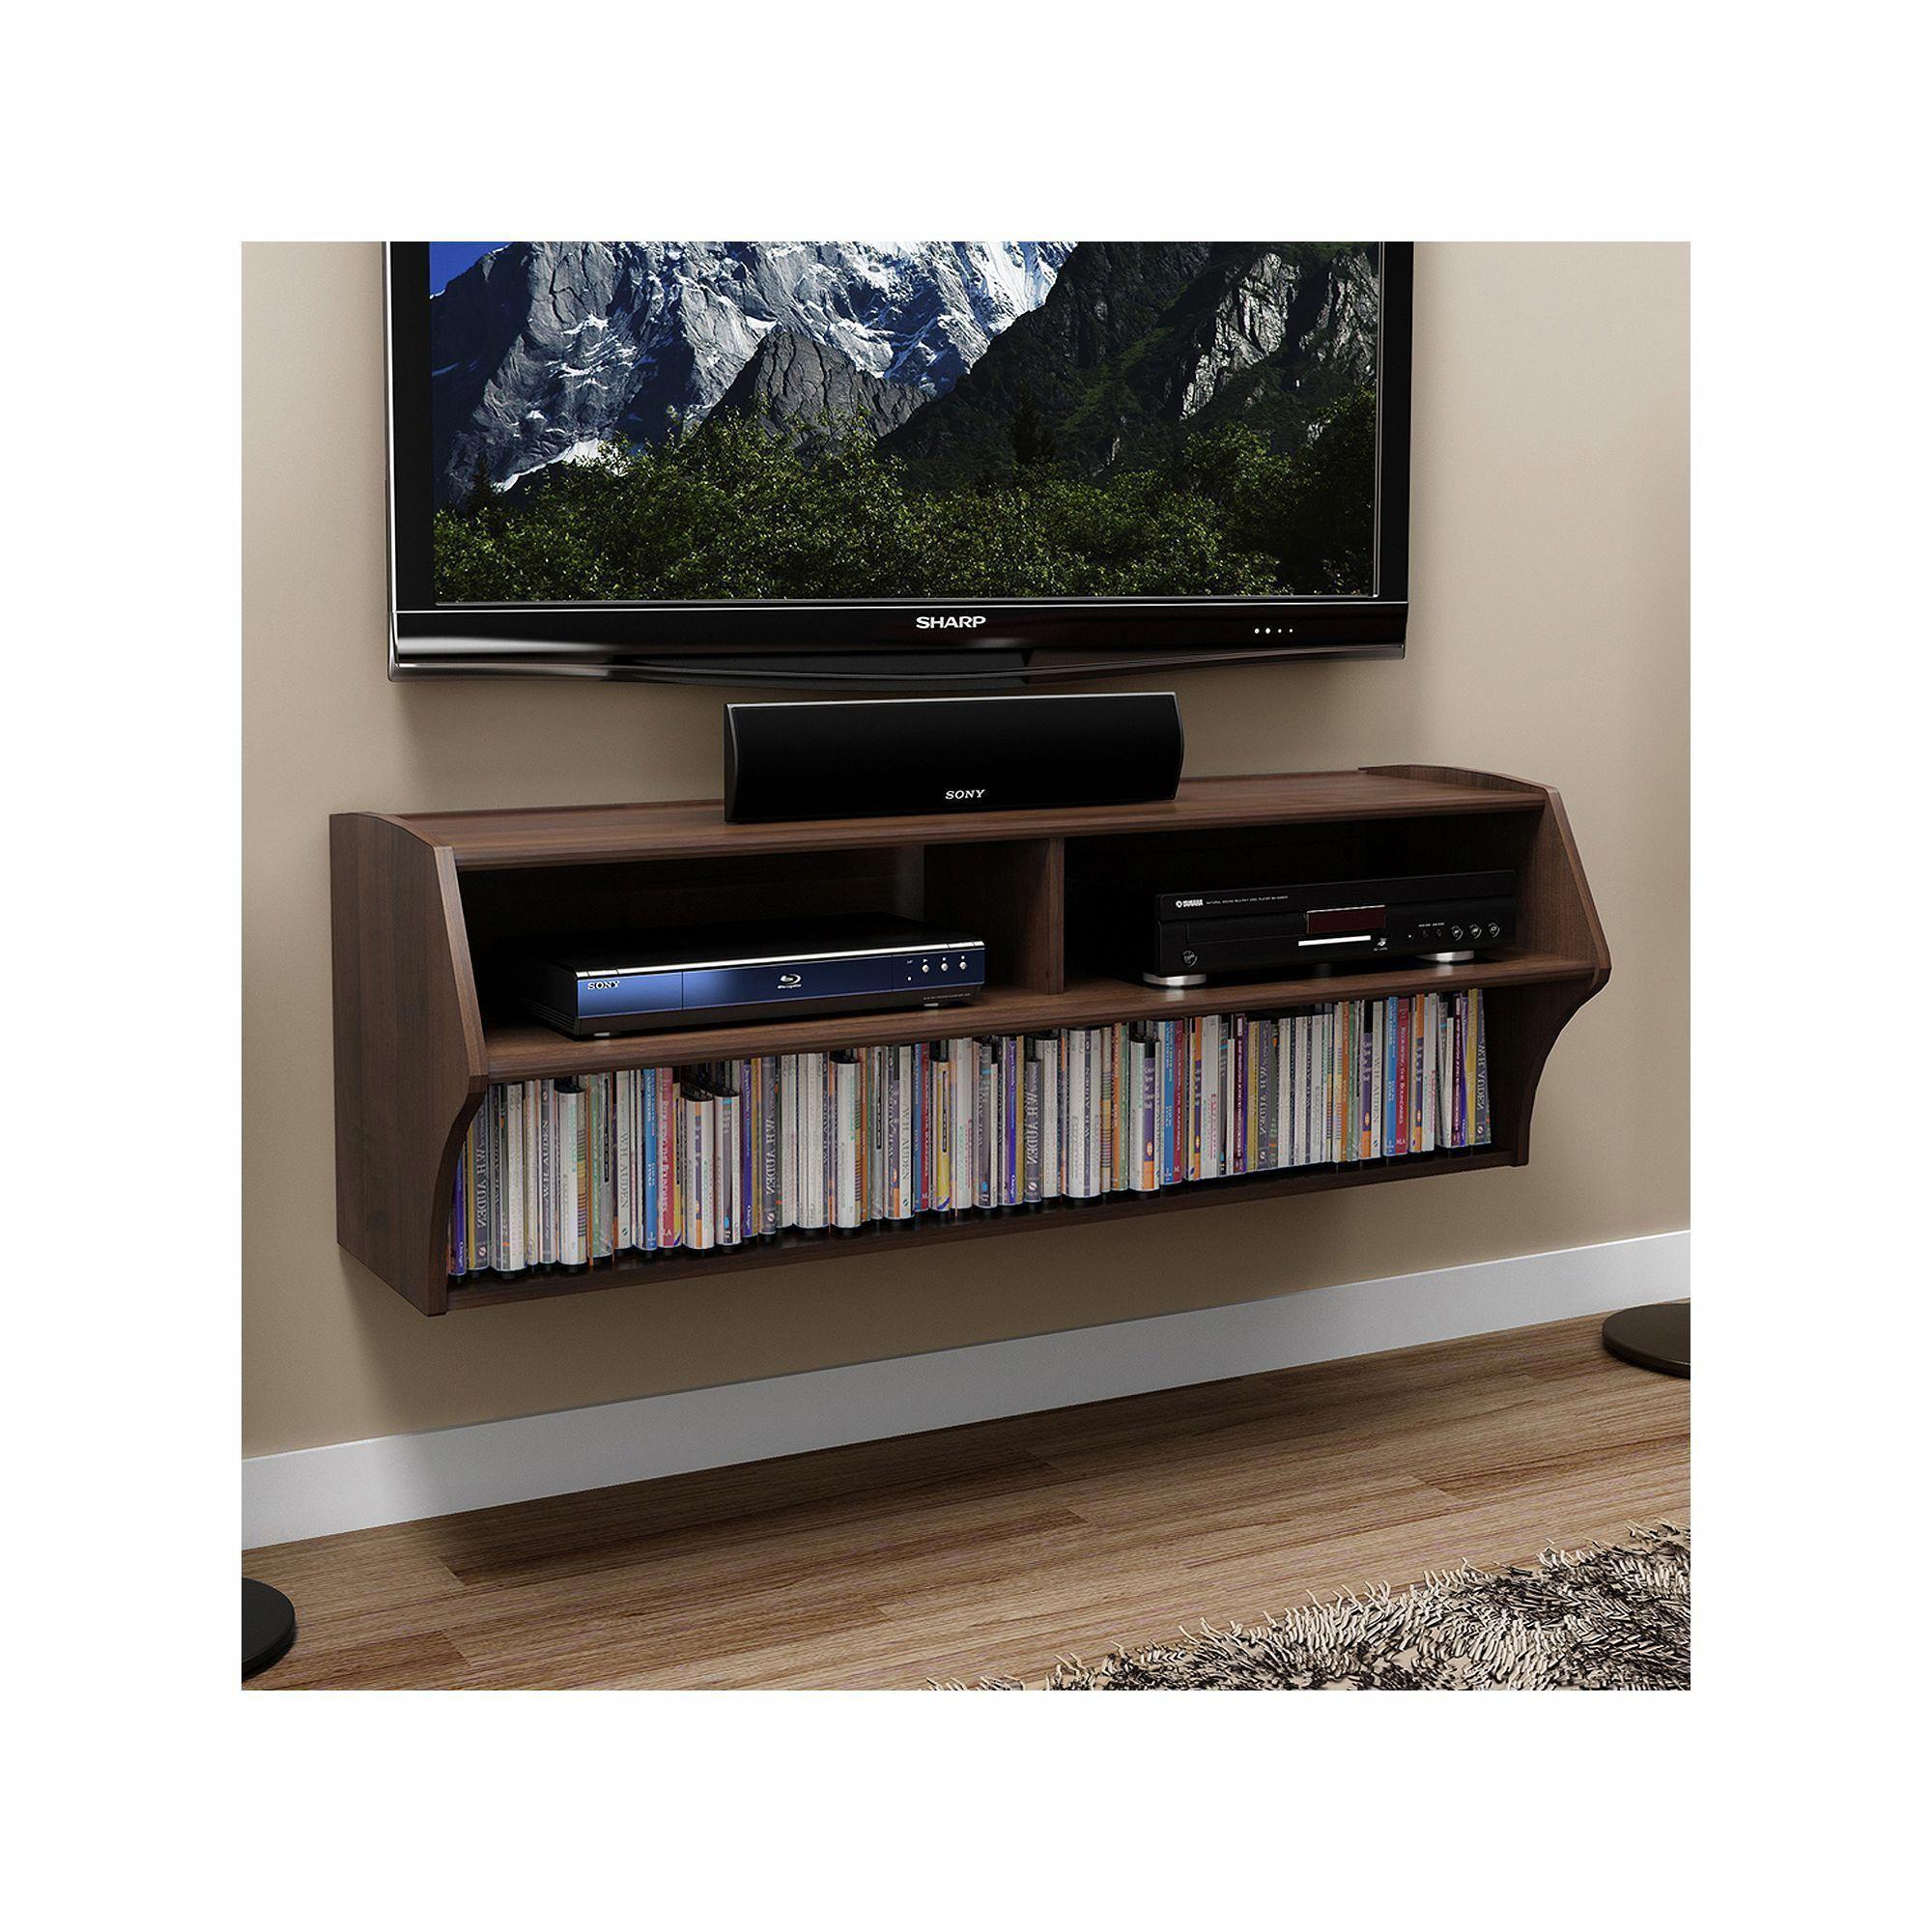 Prepac altus wall mounted entertainment center brown tvwallmount